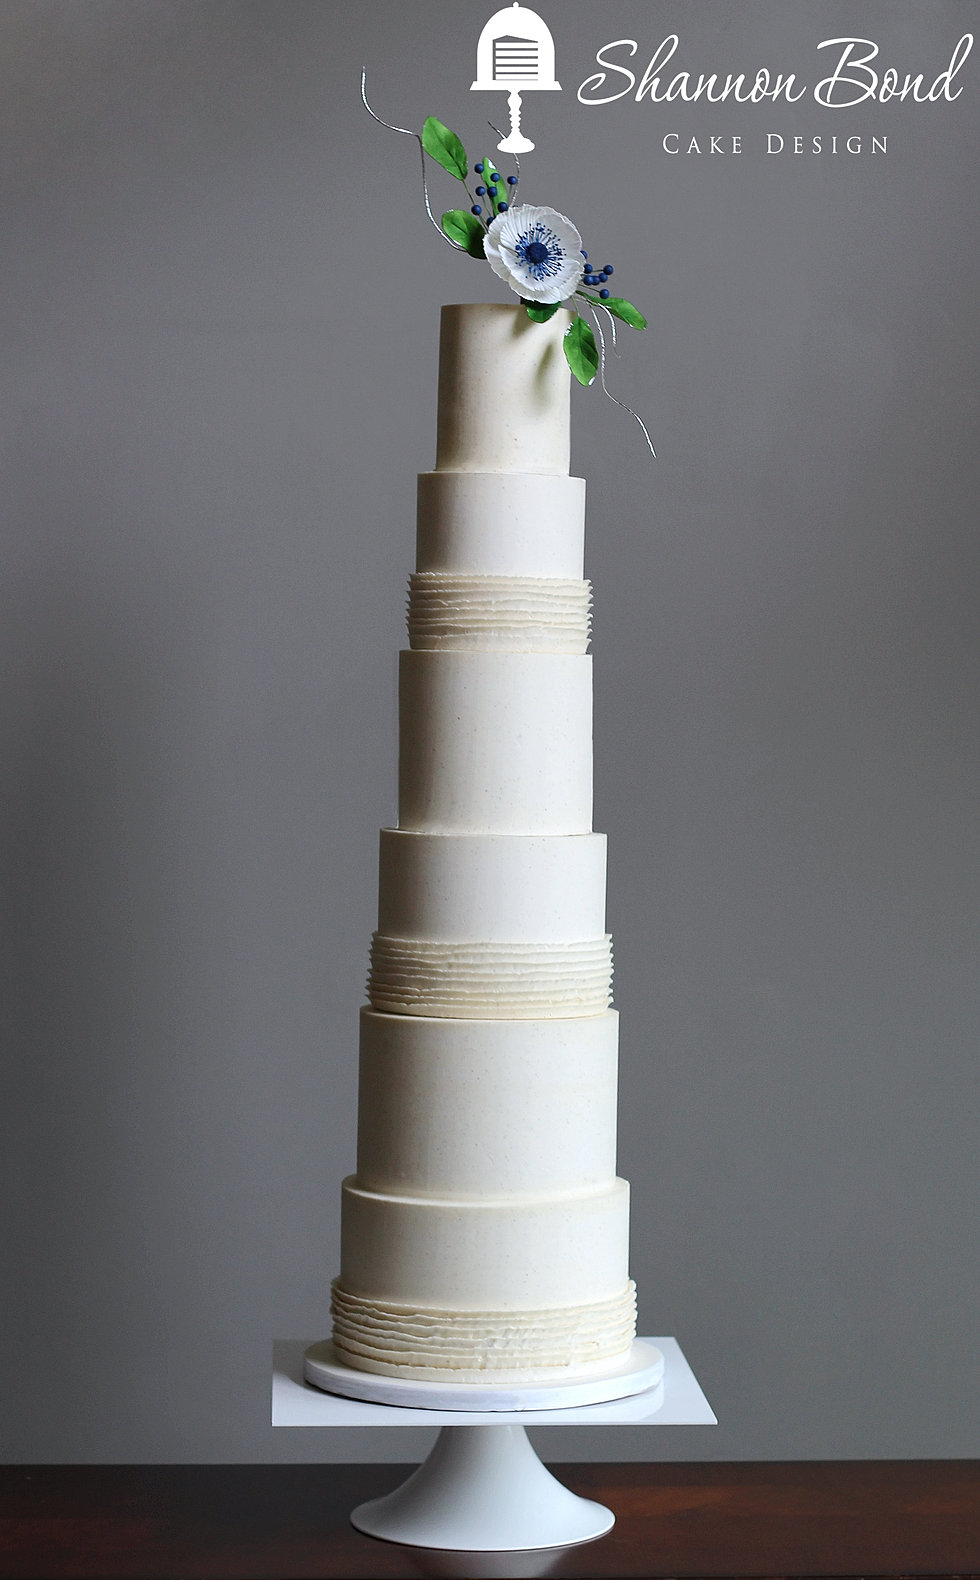 Couture Buttercream Wedding Cake